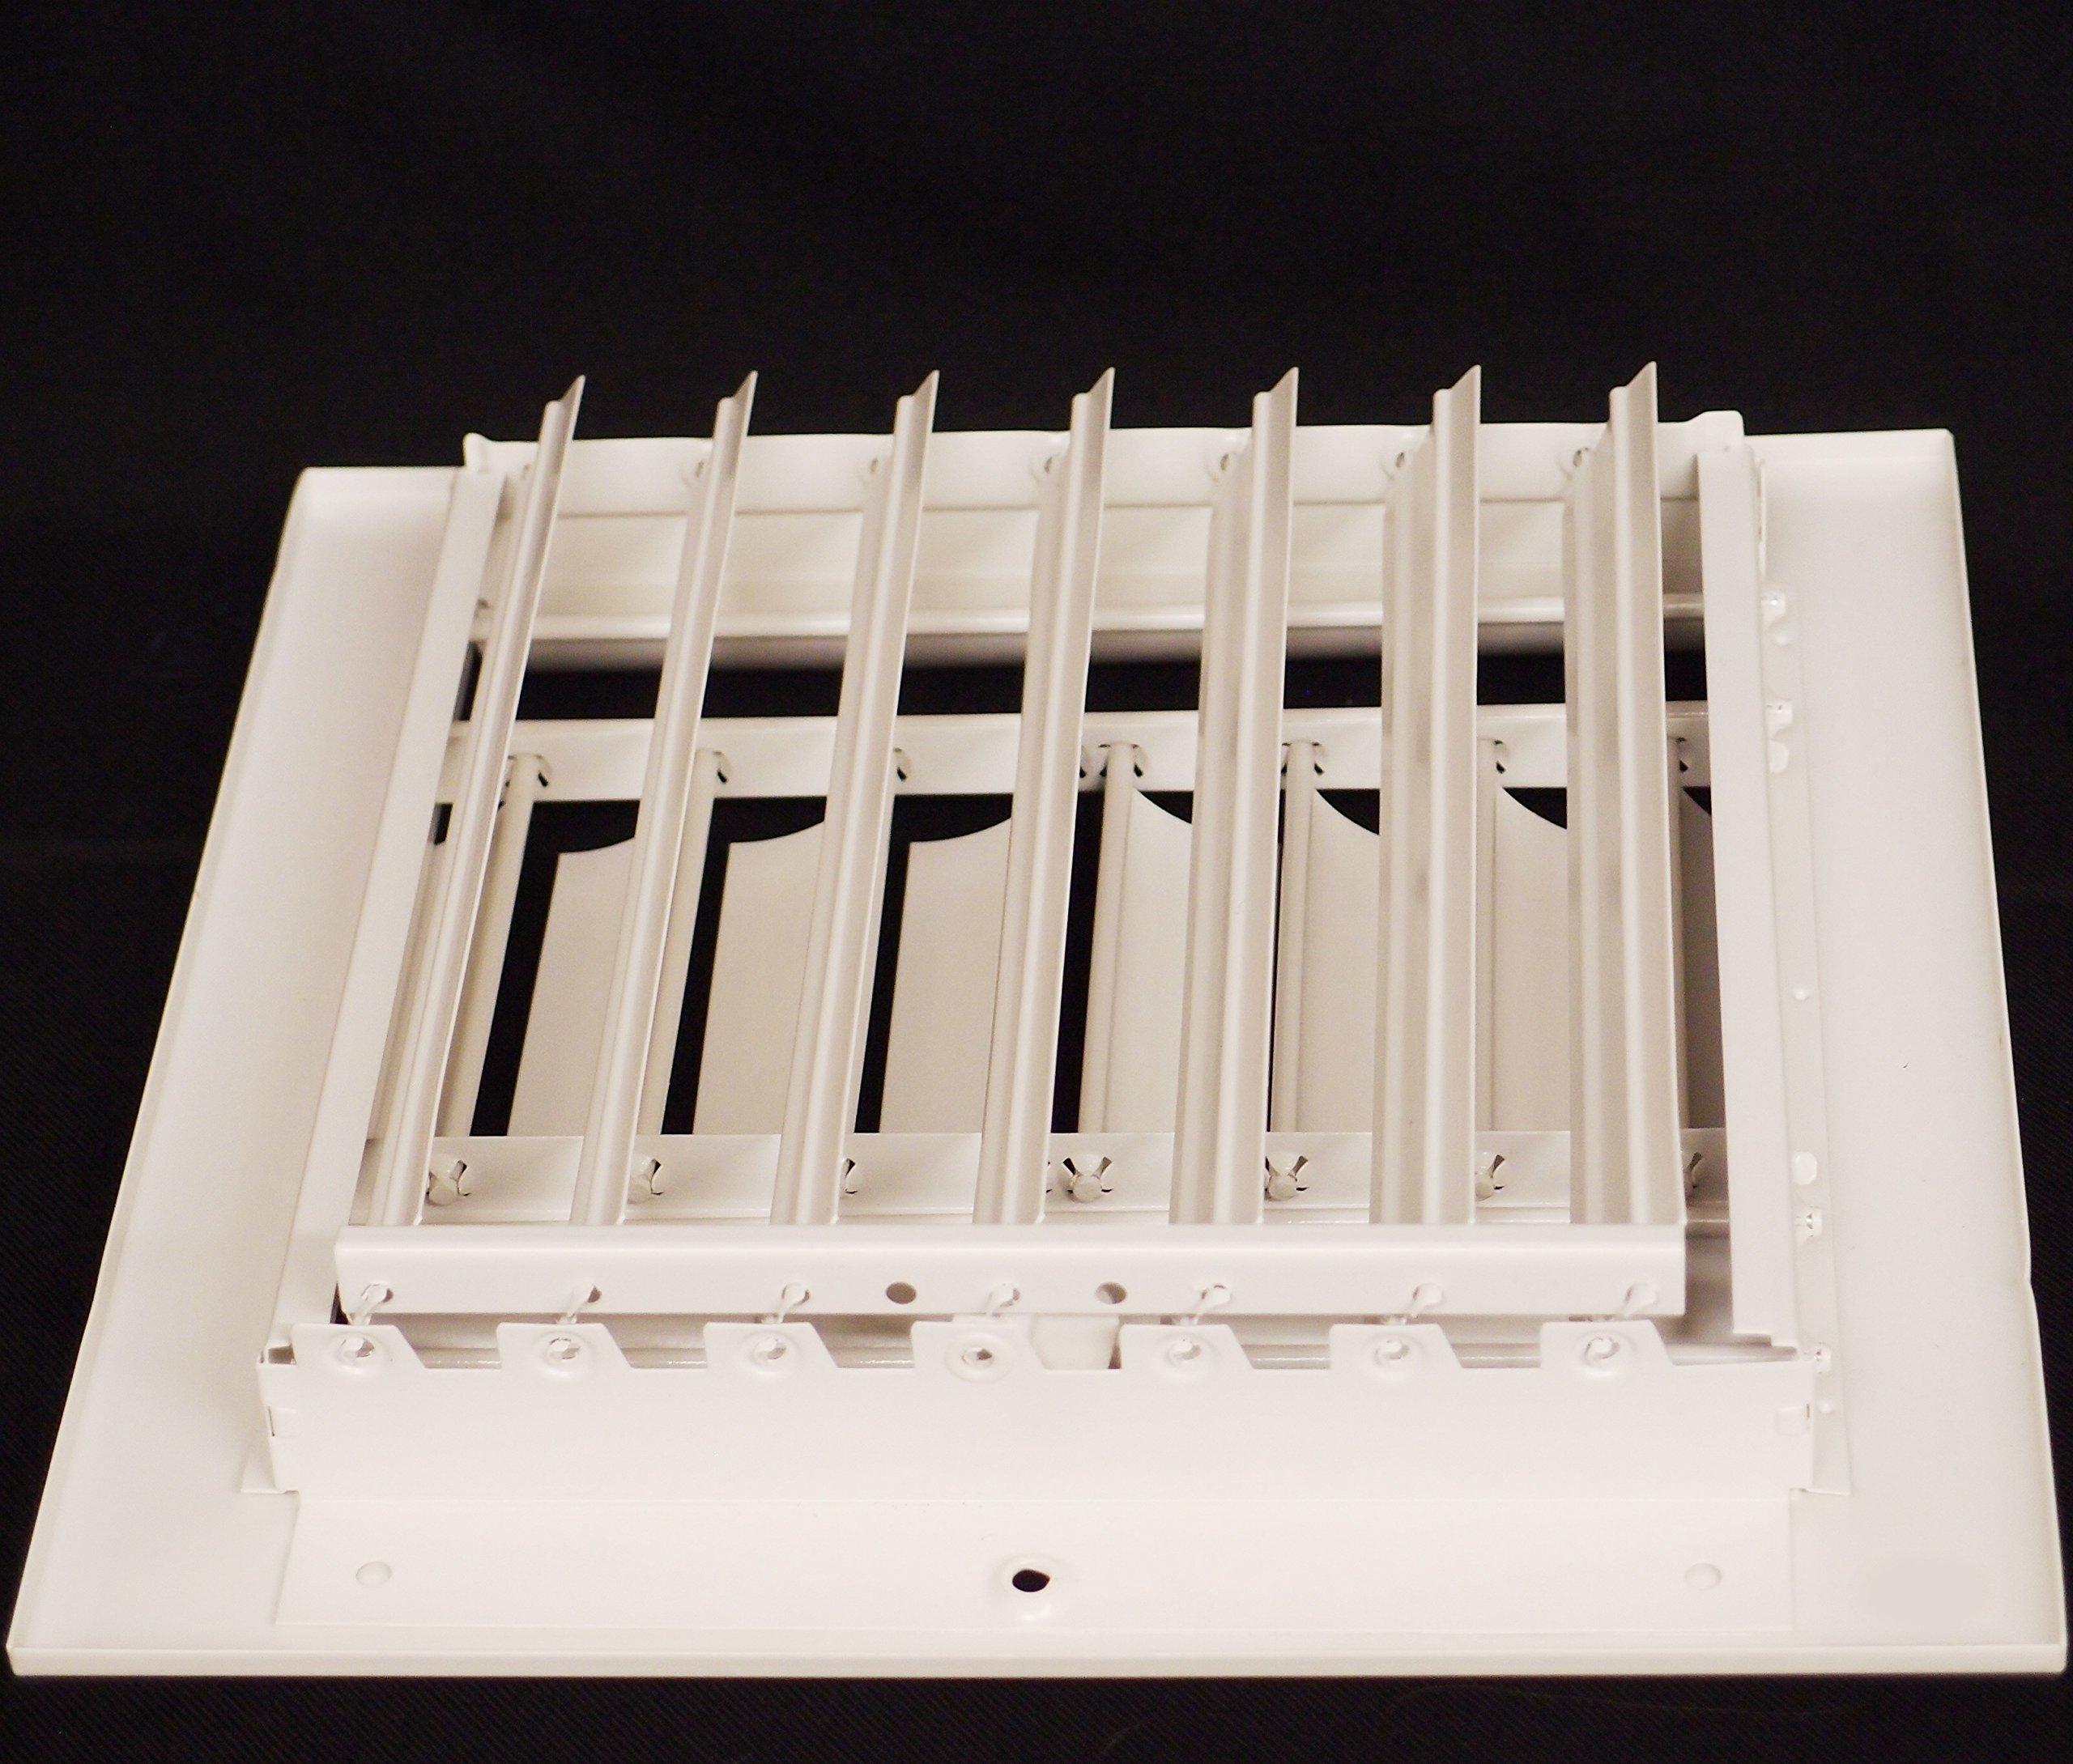 12'' x 6'' - 1-Way Air Vent - Adjustable Aluminum Curved Blades - Maximum Air Flow - HVAC Grille by HVAC Premium (Image #6)